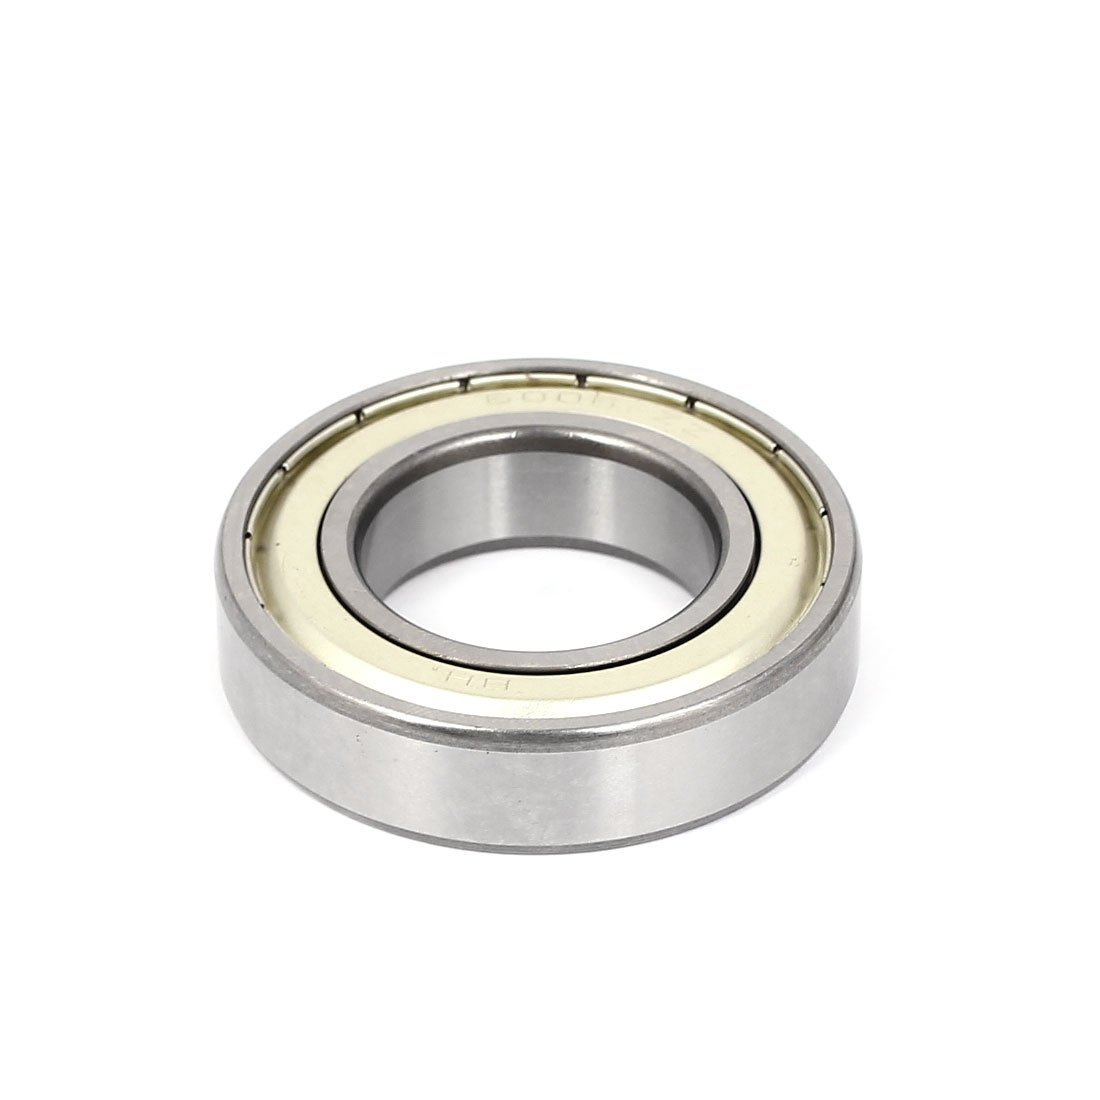 6000ZZ Ball Bearings Double Shield 10mmx26mmx8mm High Carbon Steel Z1 10pcs